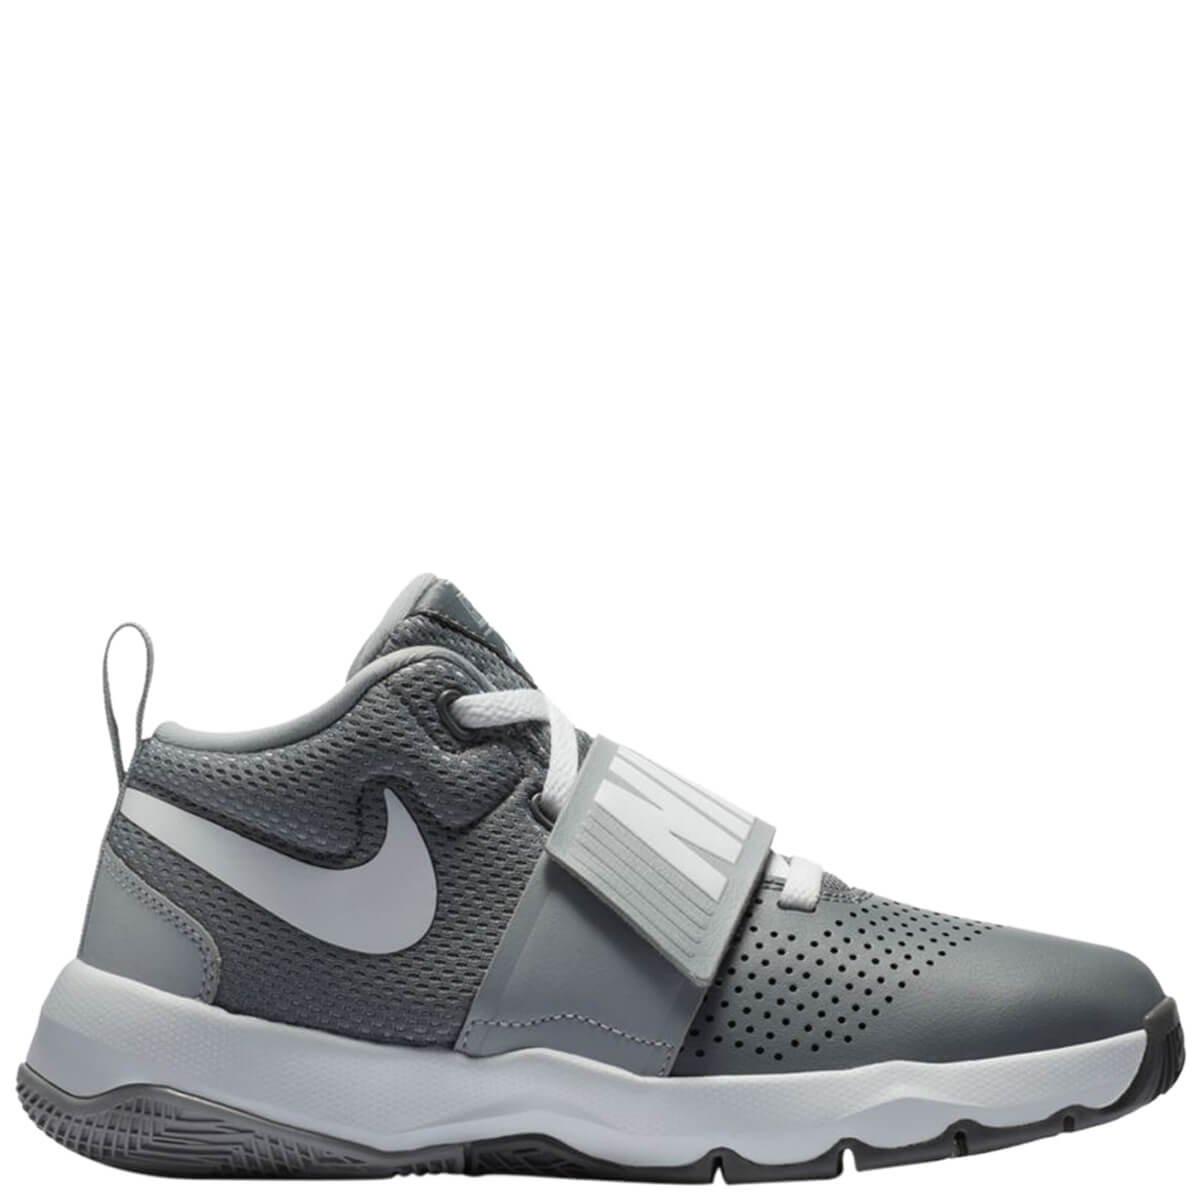 ec4d6996613 Bizz Store - Tênis Infantil Menino Nike Team Hustle D8